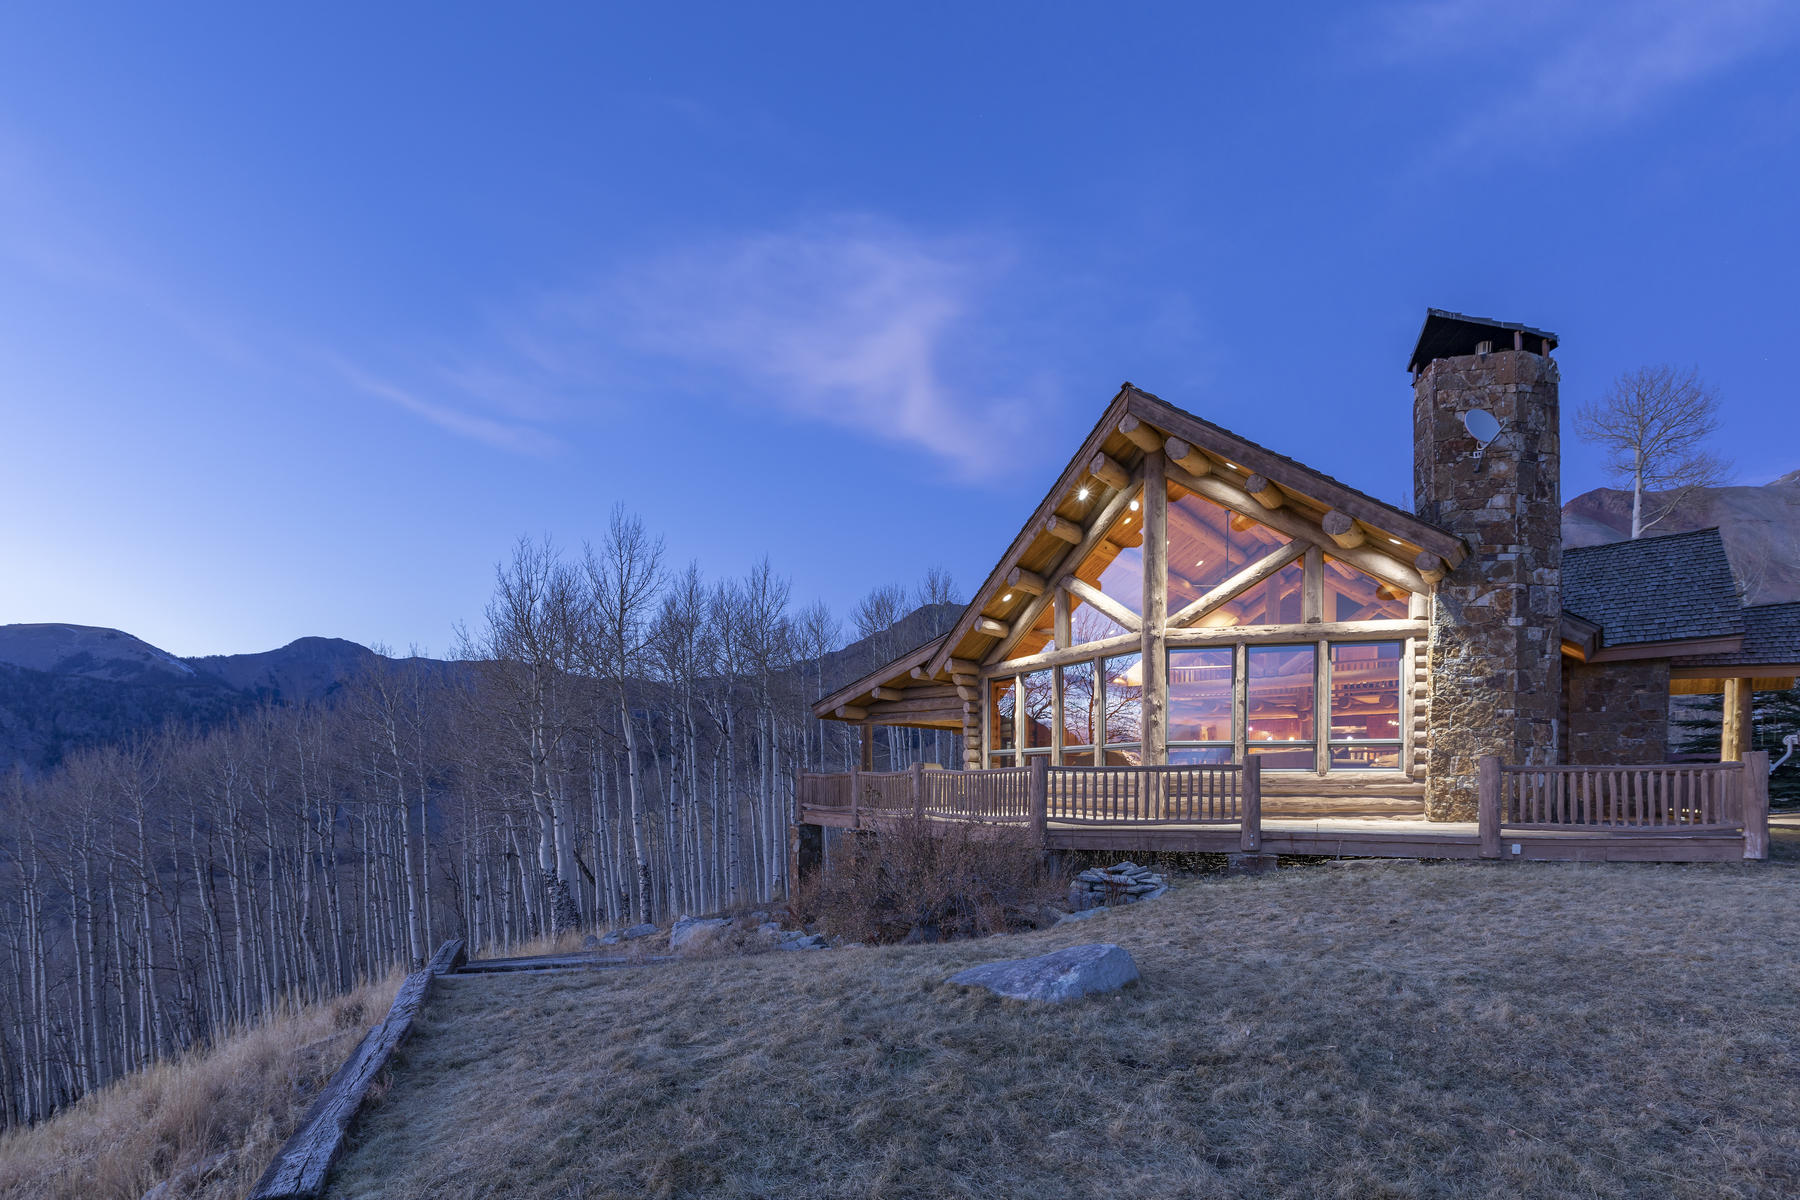 Single Family Homes for Active at 140 W. Serapio Drive Telluride, Colorado 81435 United States